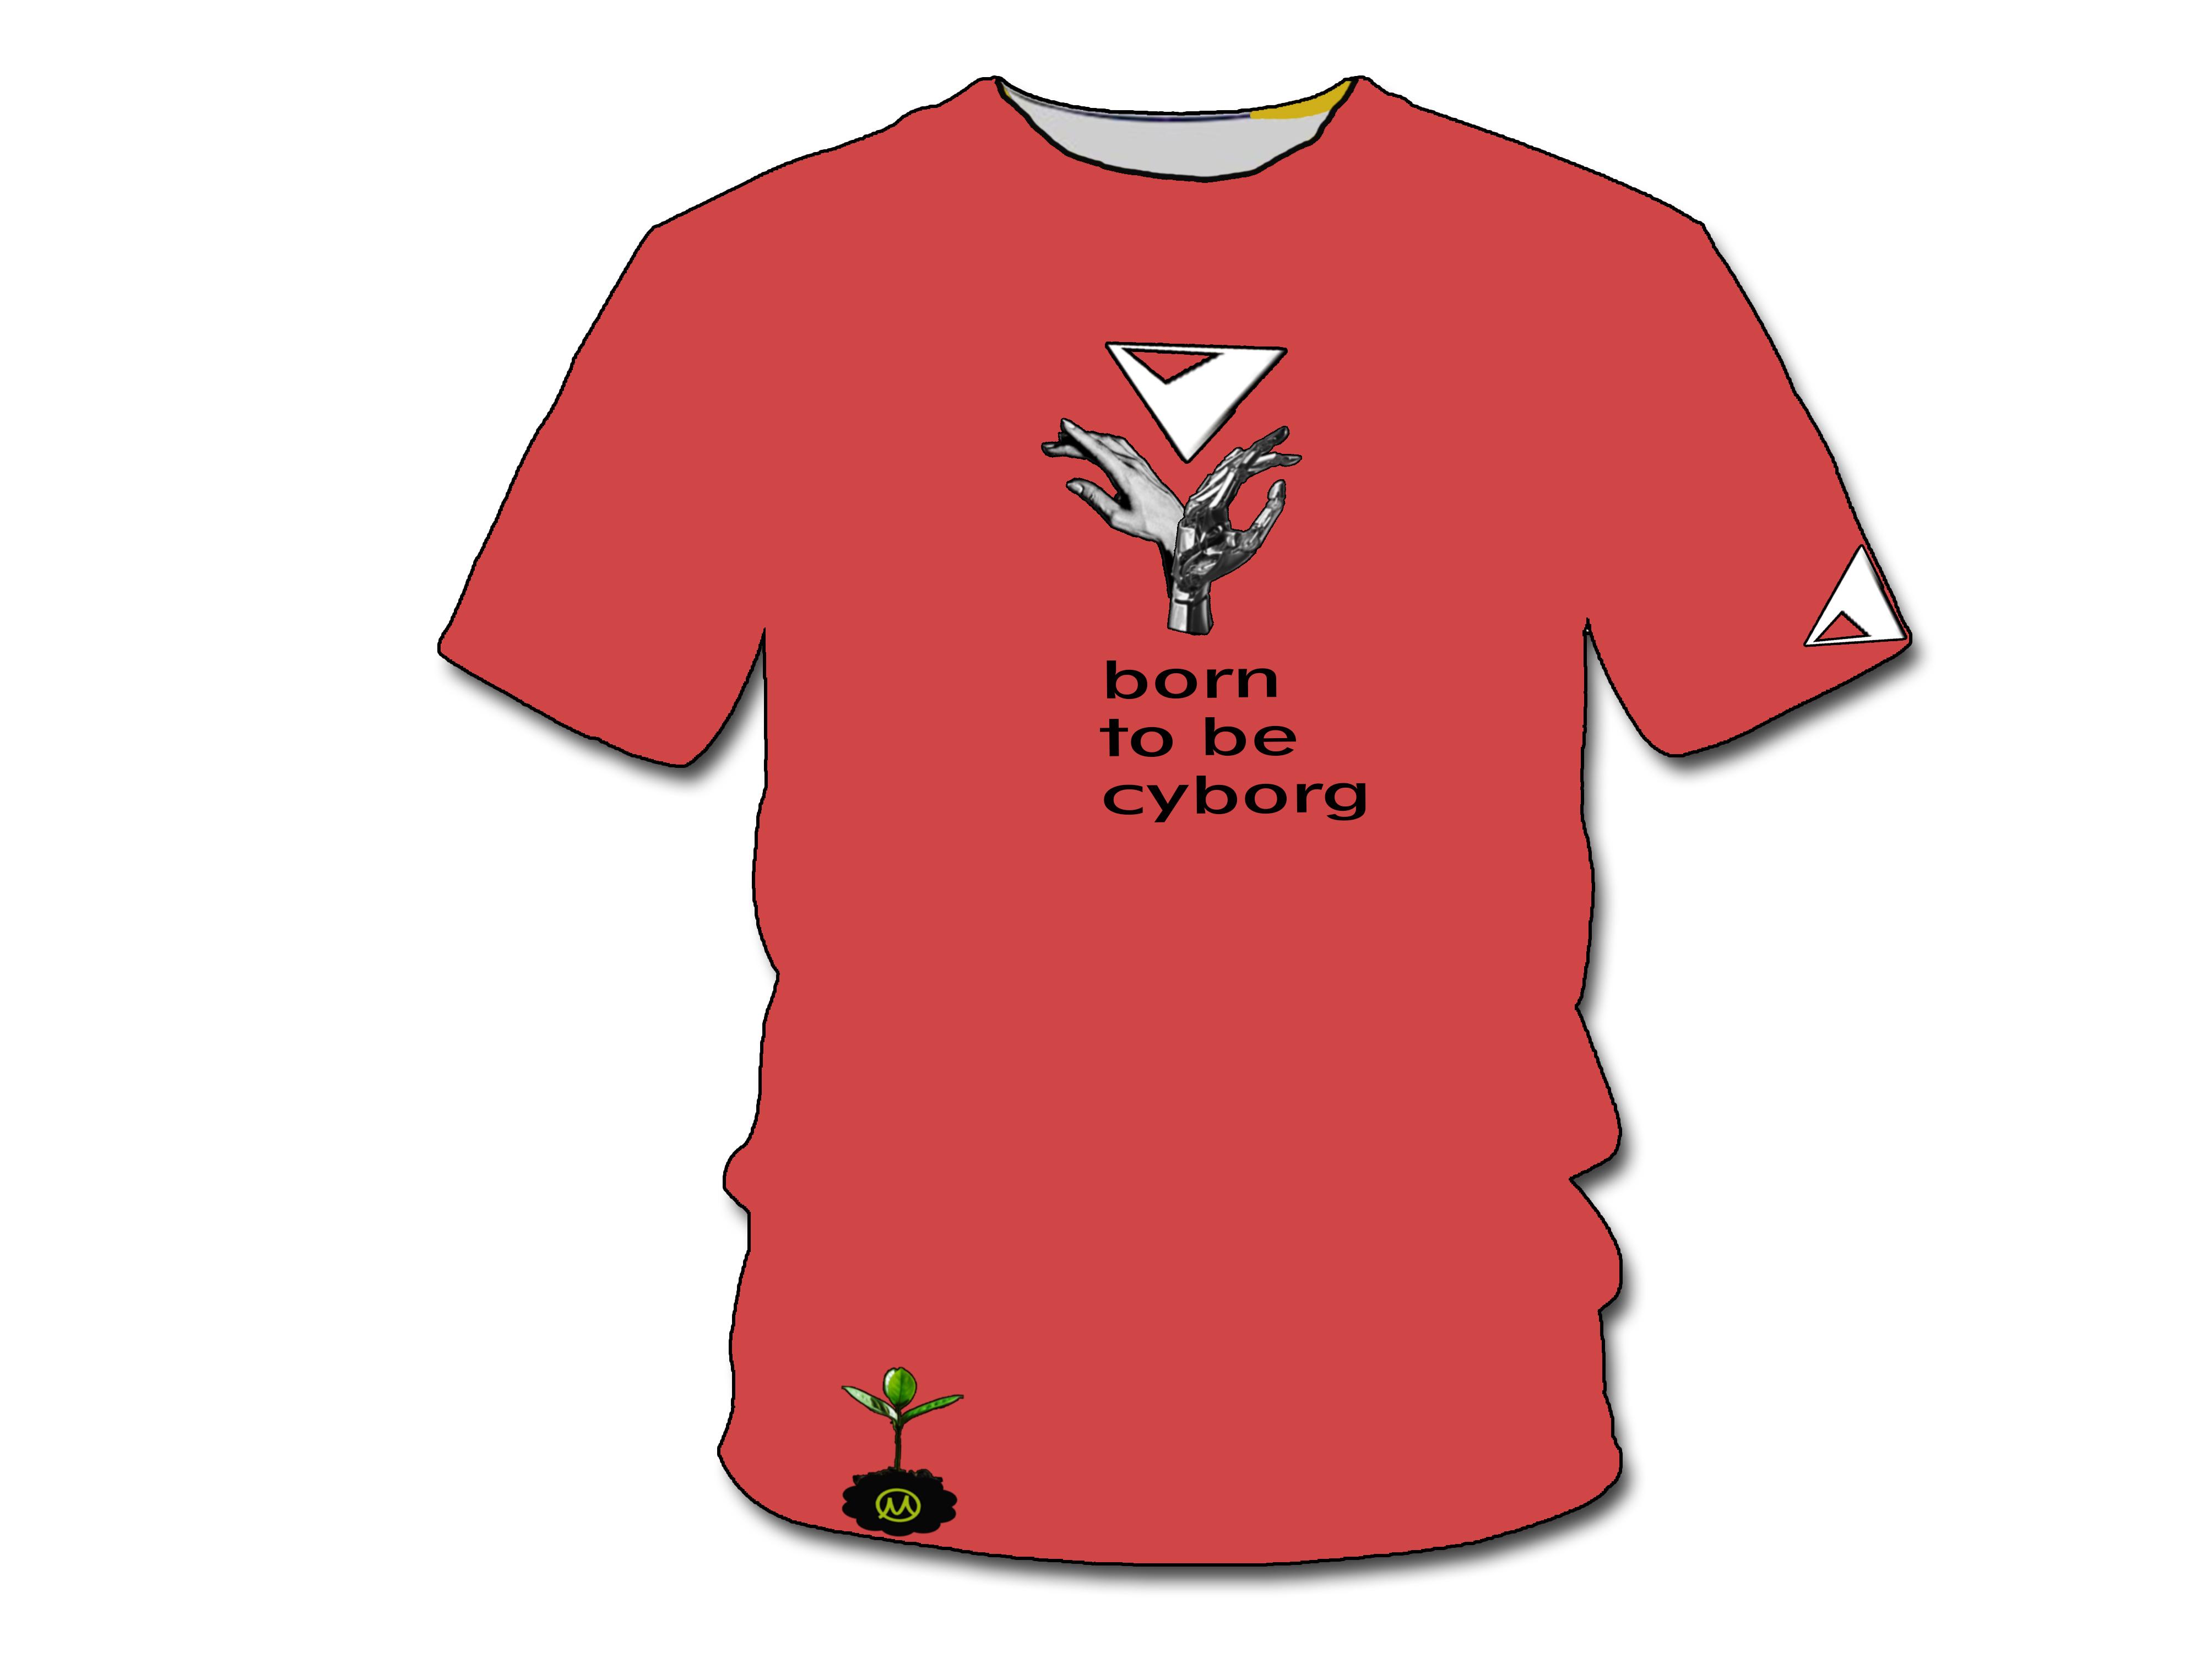 Нарисовать принты на футболки для компании Моторика фото f_68160a5368a6057e.jpg